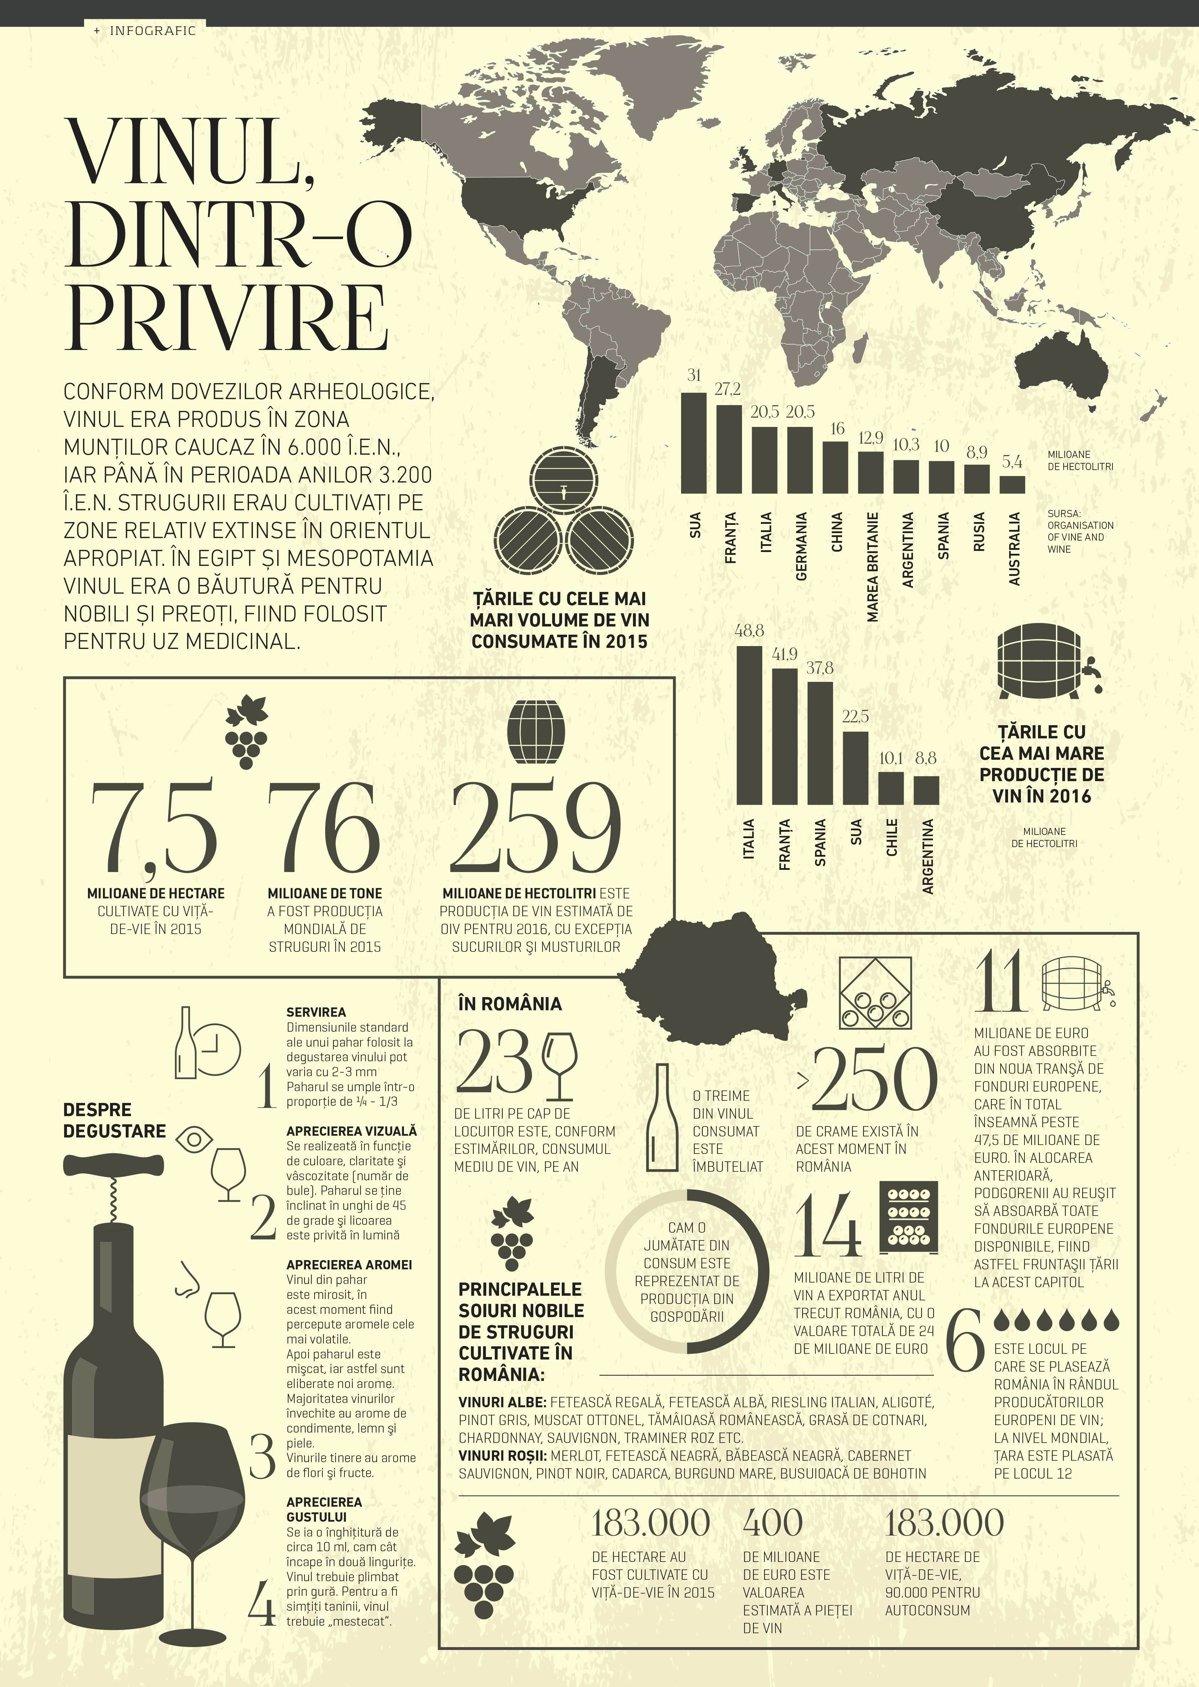 Vinul, dintr-o privire